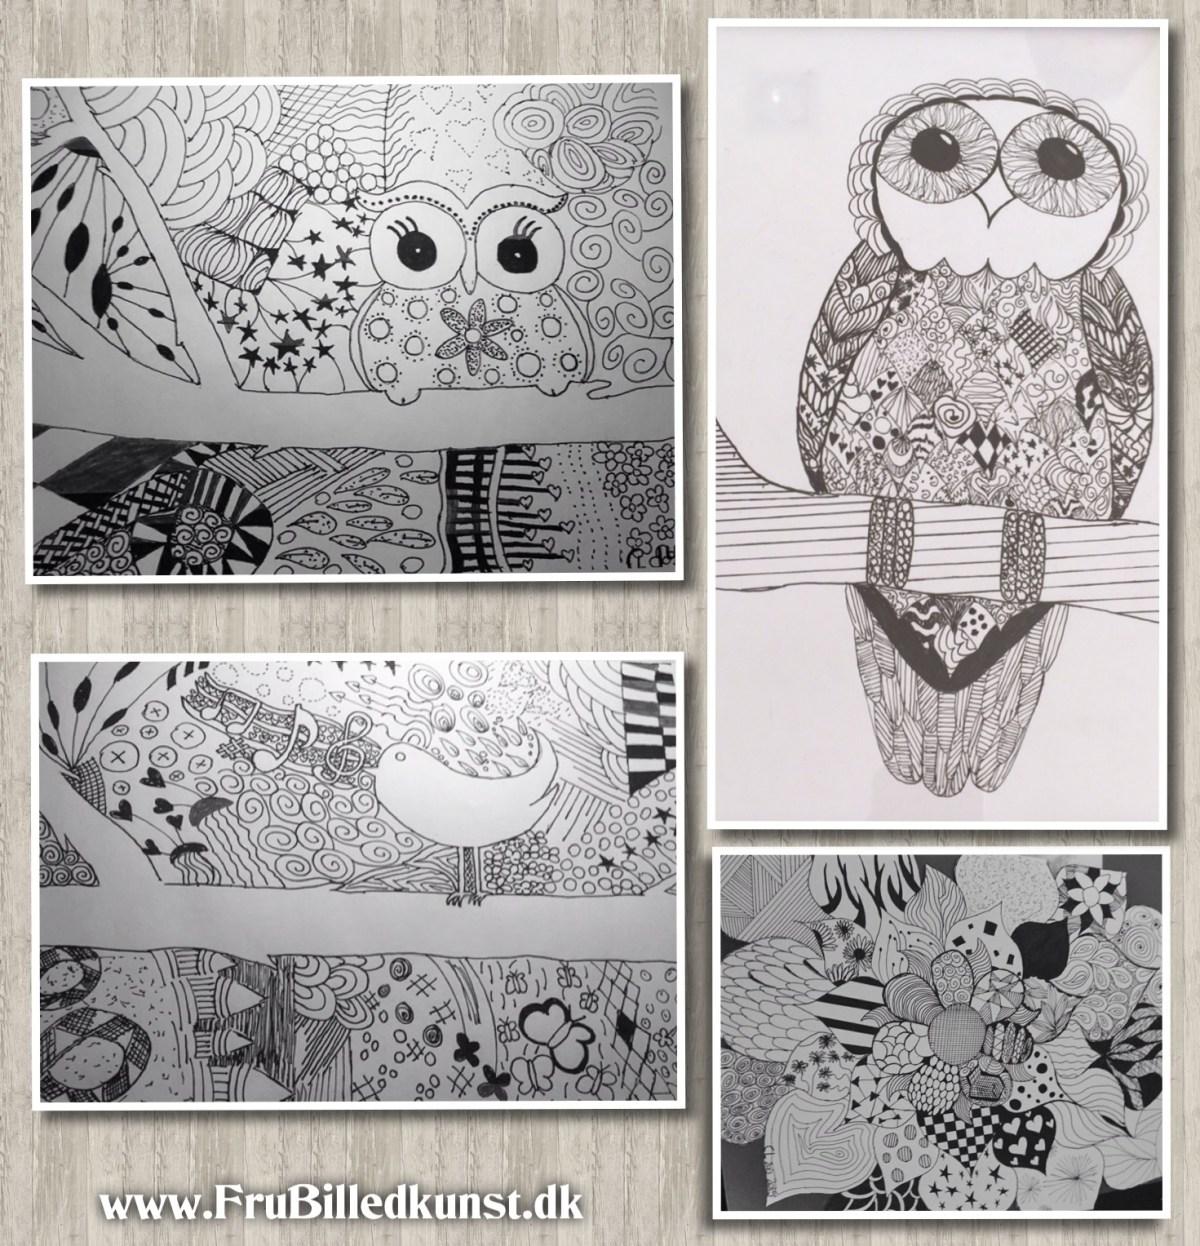 www.FruBilledkunst.dk - Claras doodles